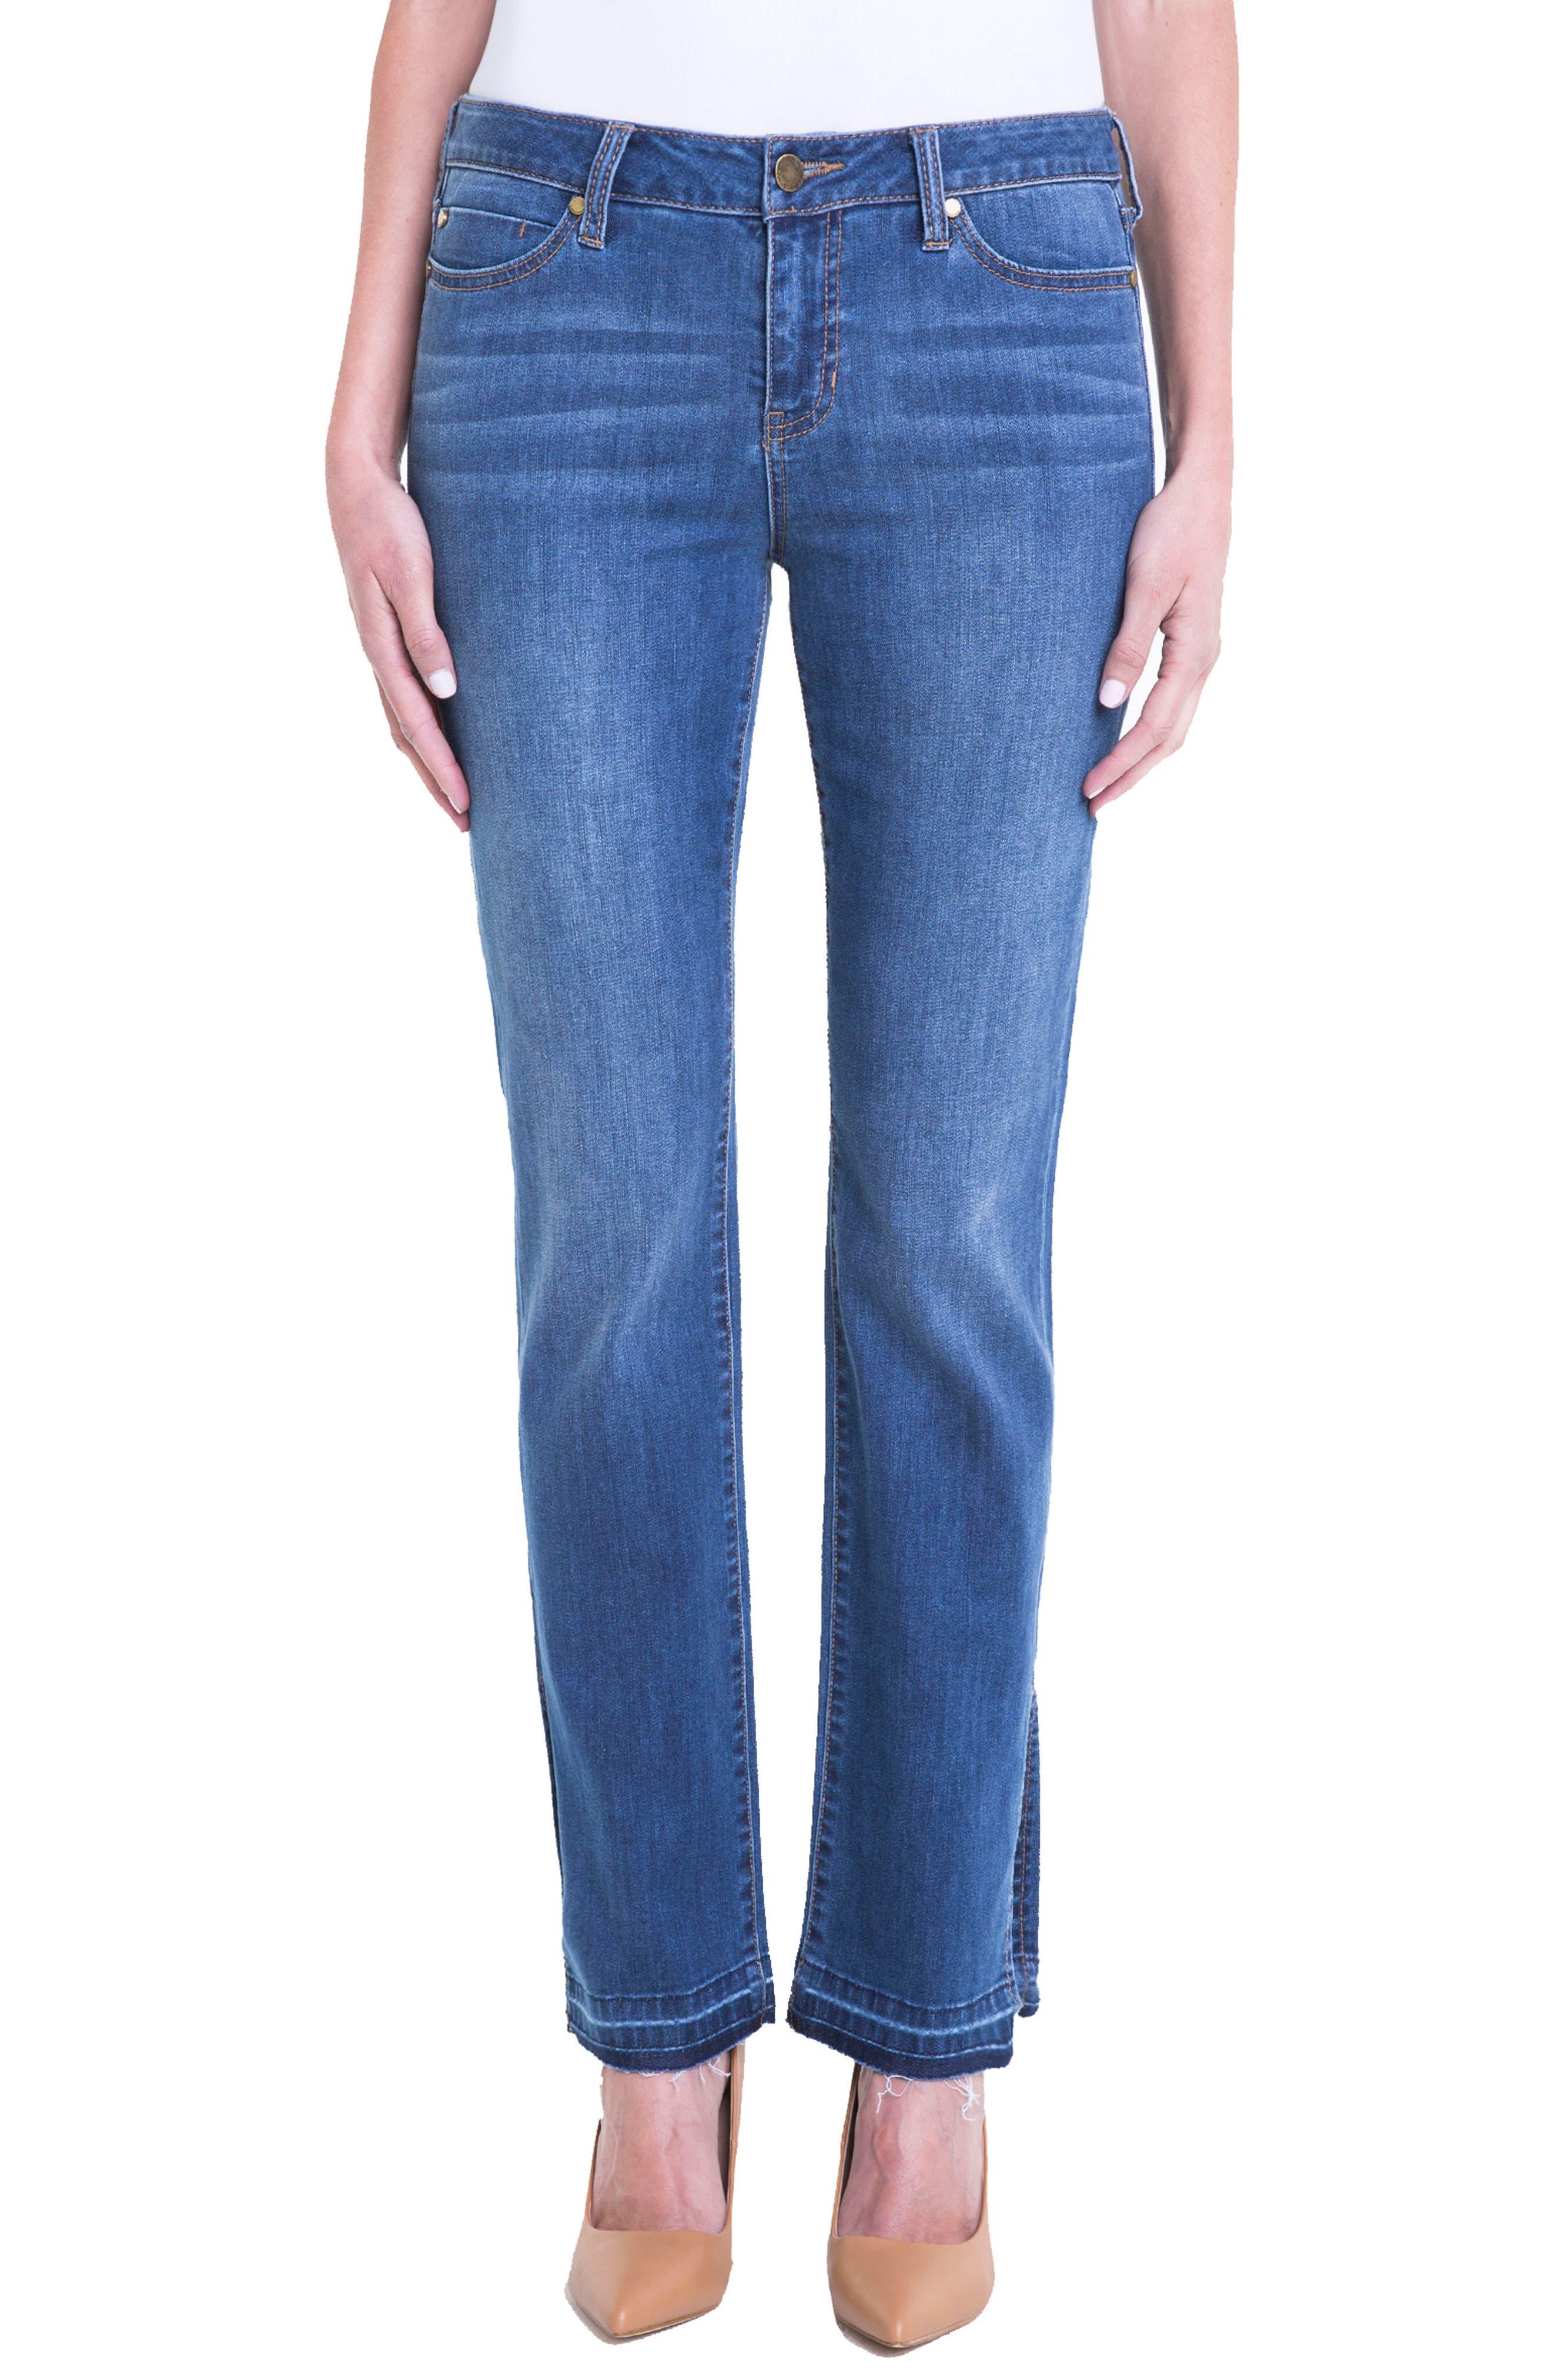 Tabitha Release Hem Straight Leg Jeans,                         Main,                         color, Montauck Mid Blue